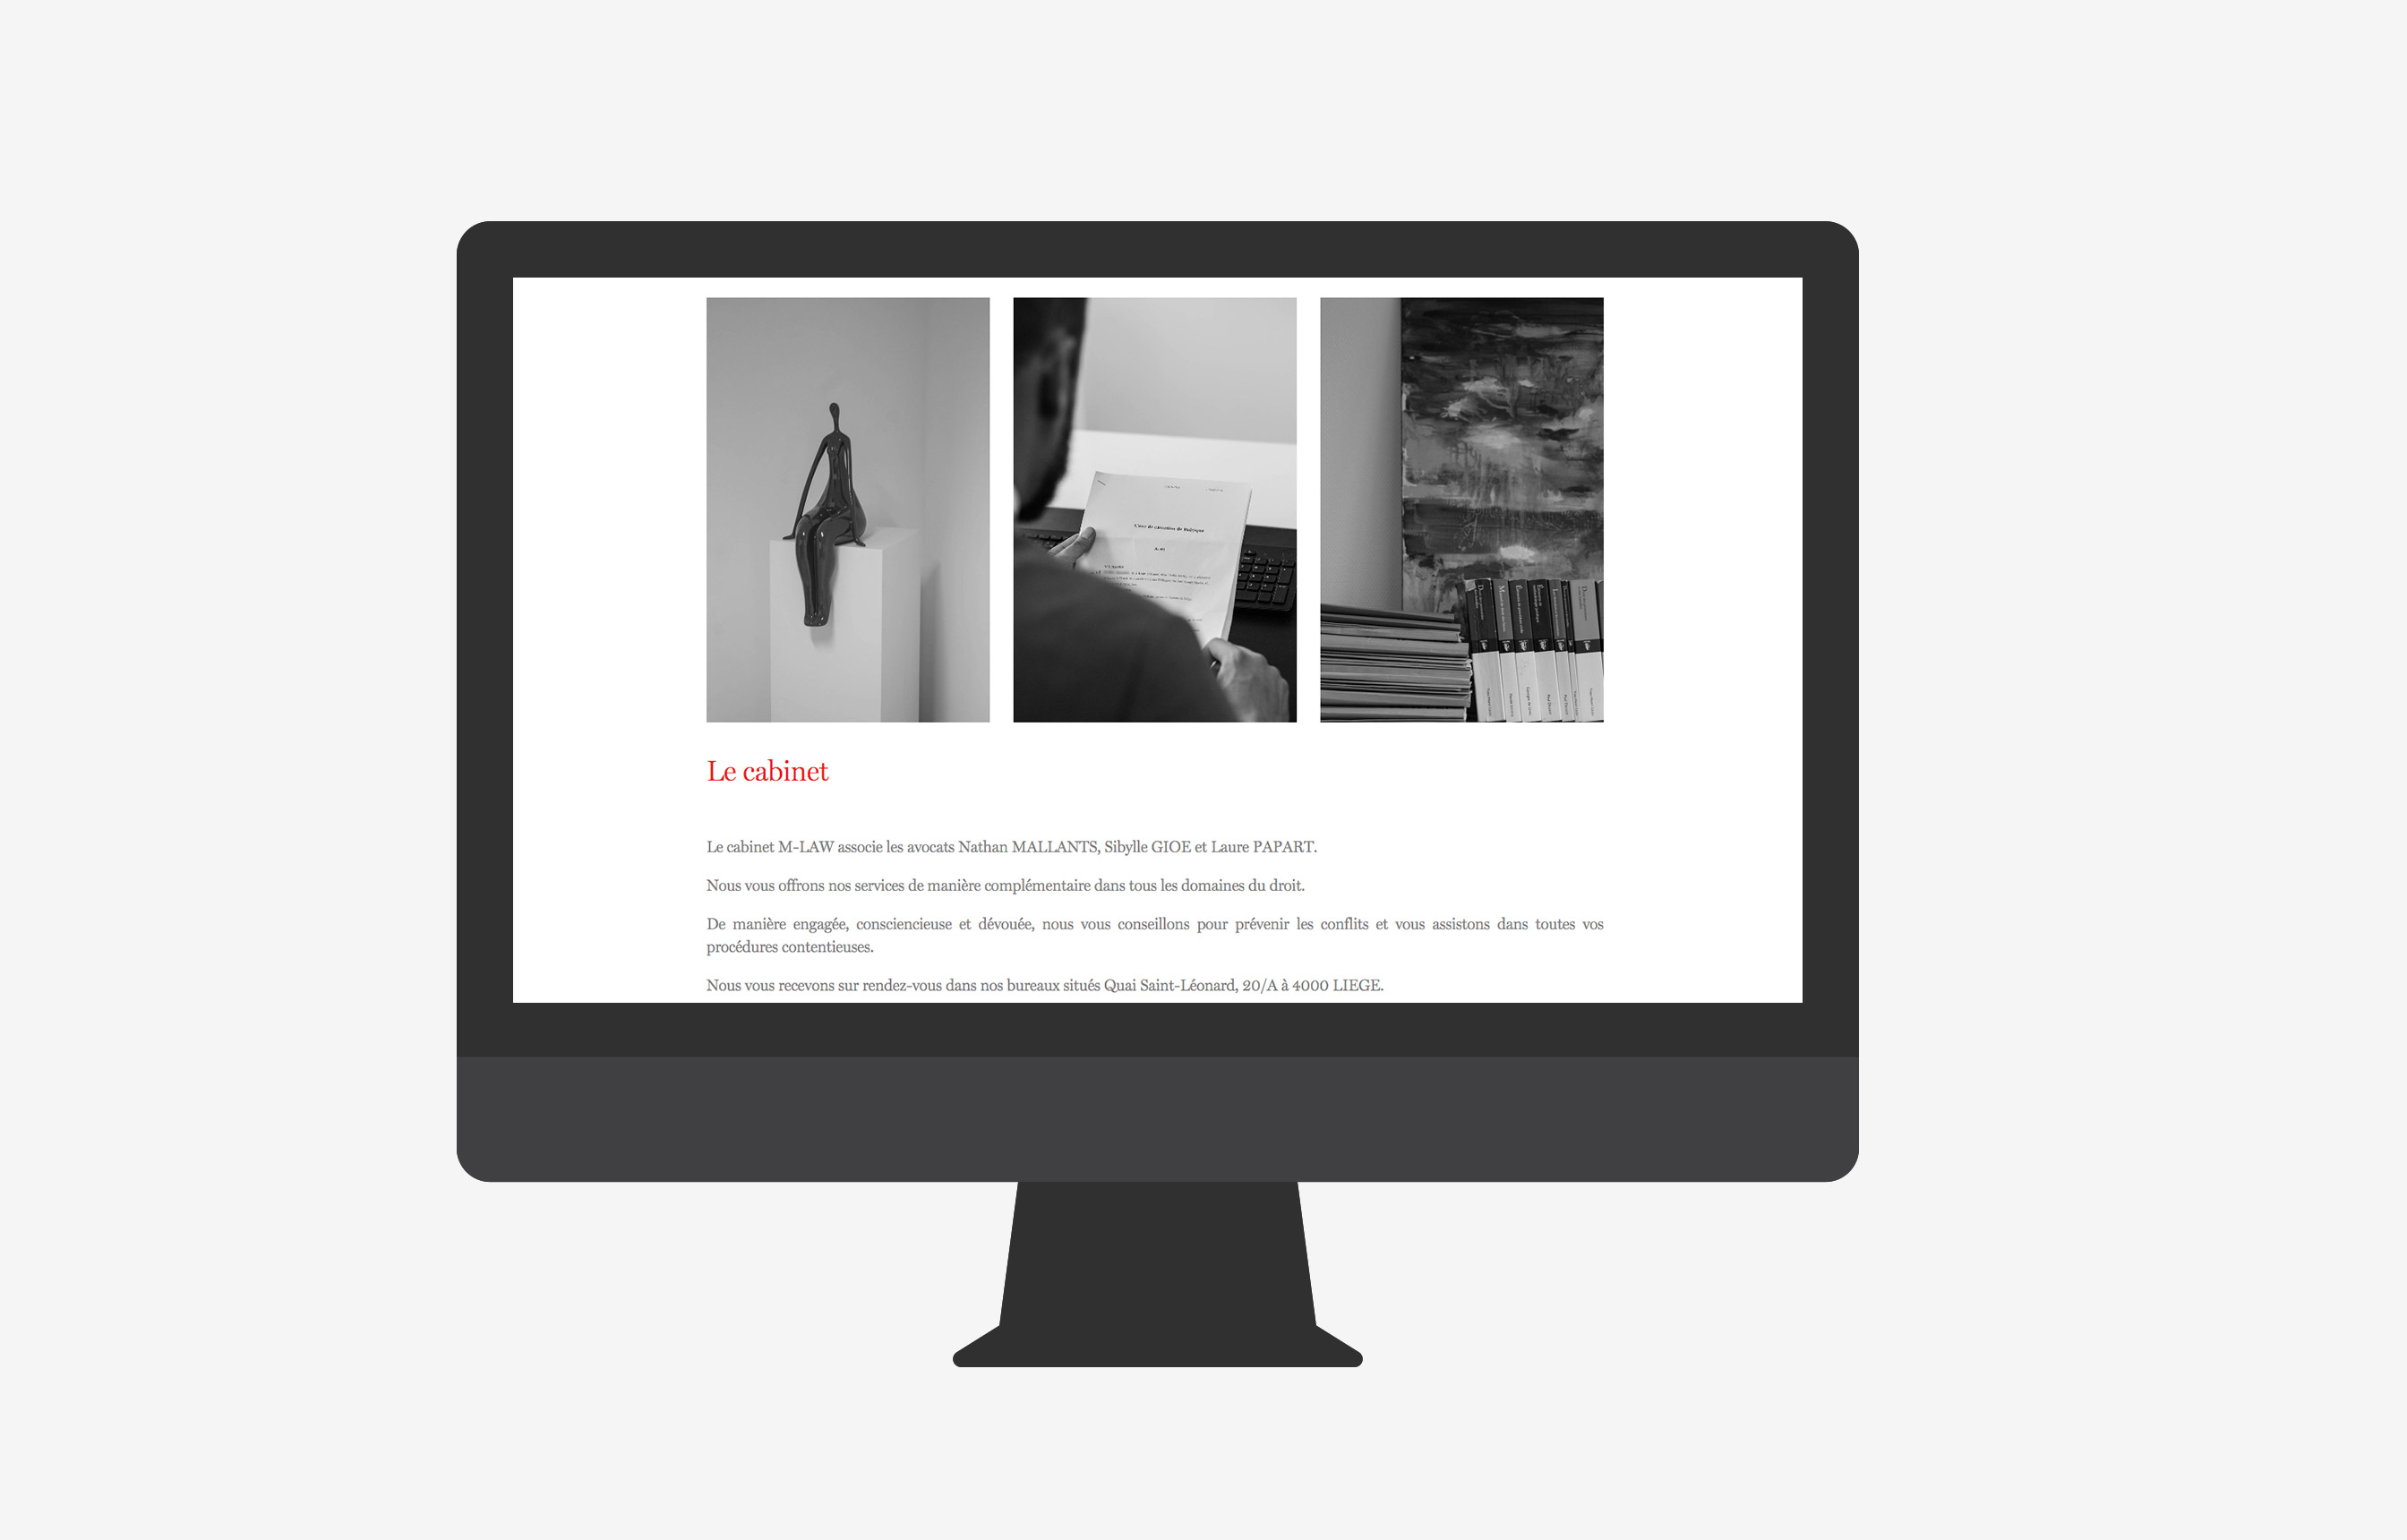 02-mlaw-pikteo-webdesign-graphic-design-freelance-paris-bruxelles-londres